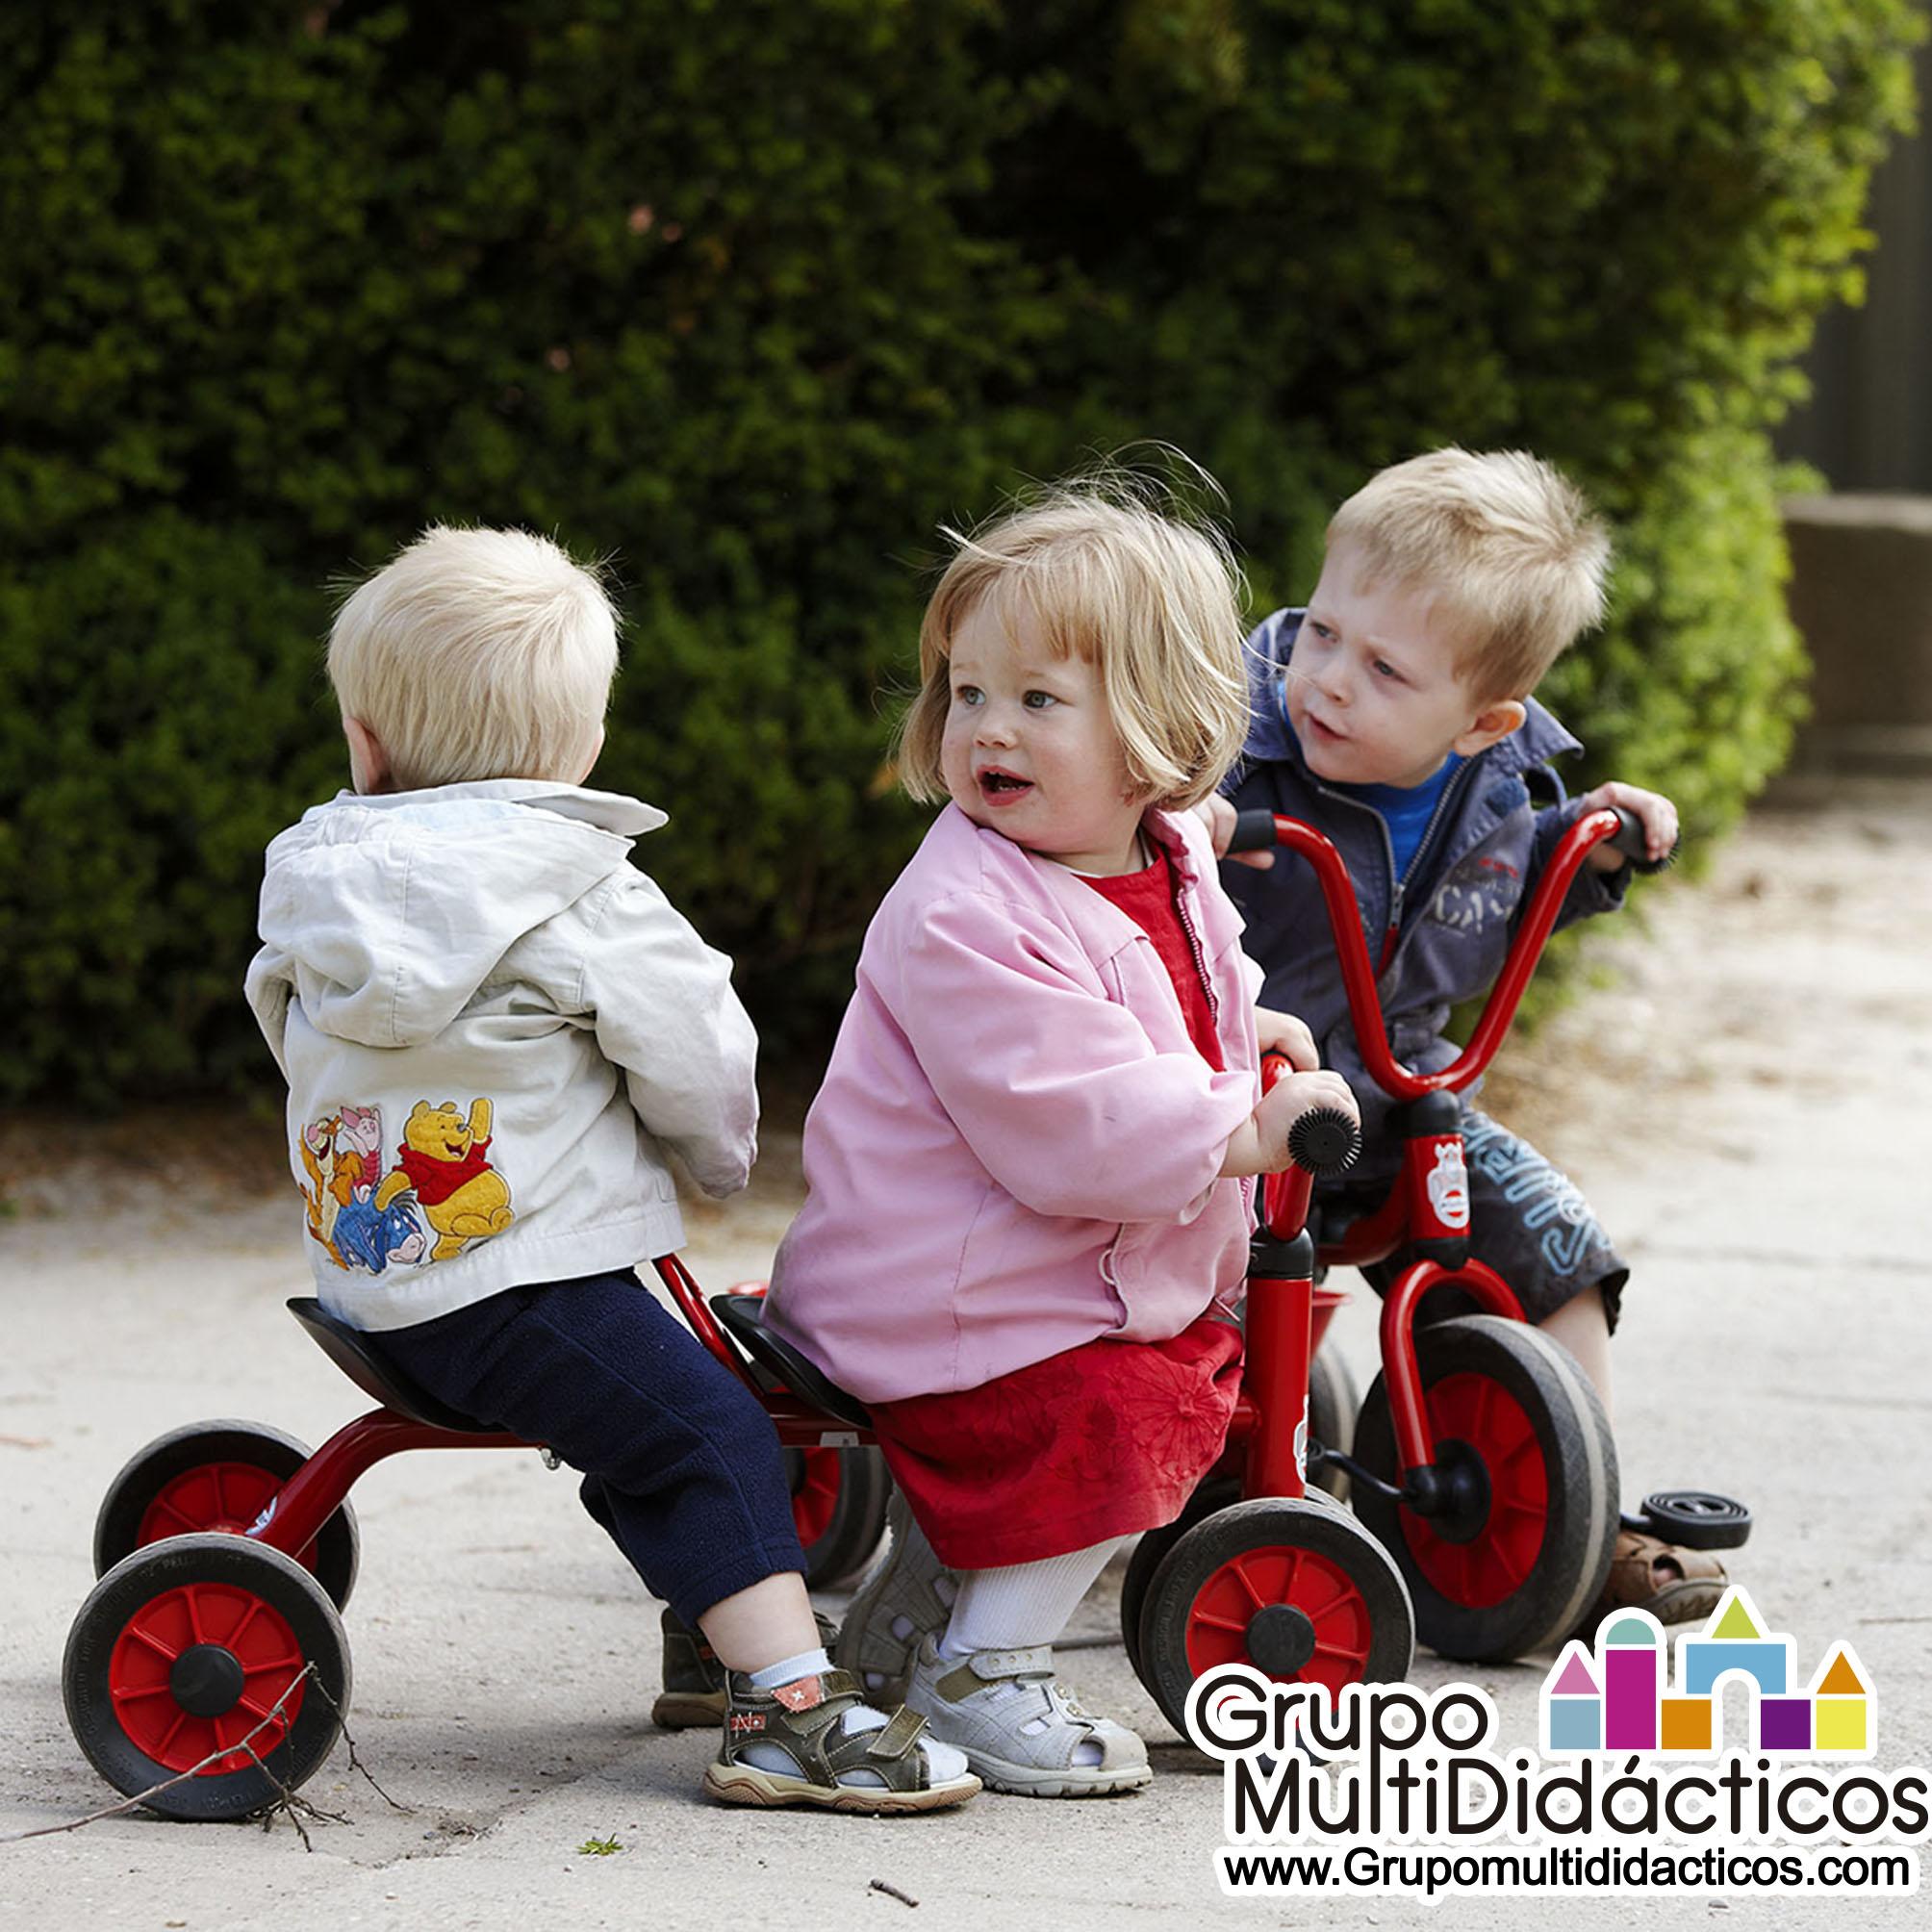 https://multididacticos.com/images/productos/peq/triciclo%20tanden%20doble%2048b.jpg